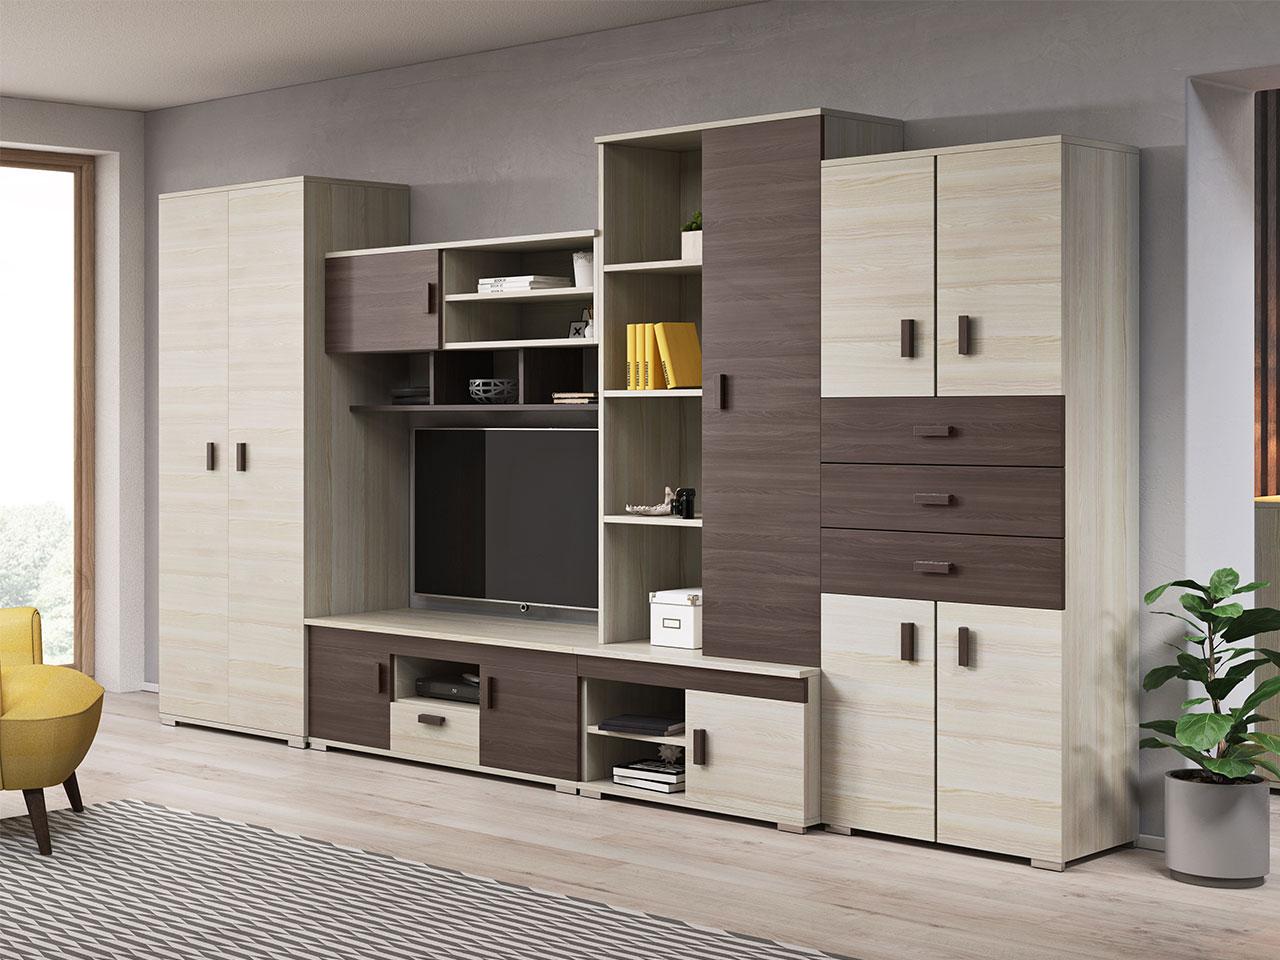 Neu Anbauwand Lowboard Modern Wohnwand Wohnzimmer Modern Schrank